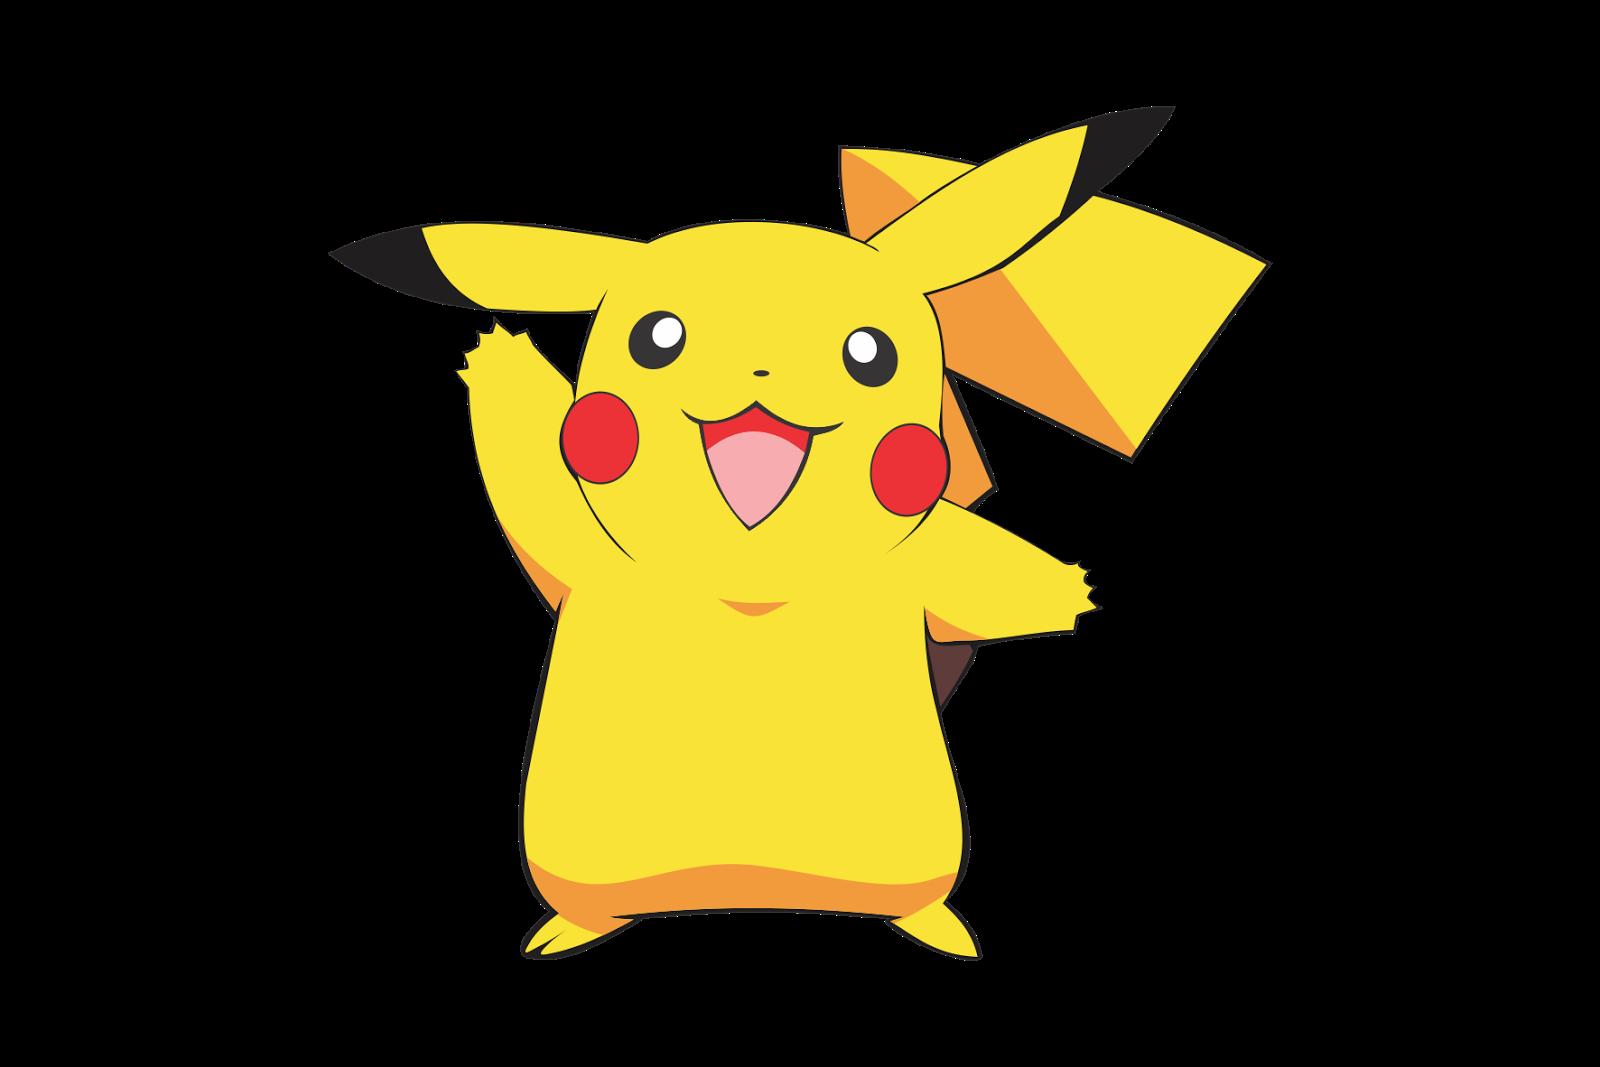 Youtube clipart pokemon. Go galeria de imagens